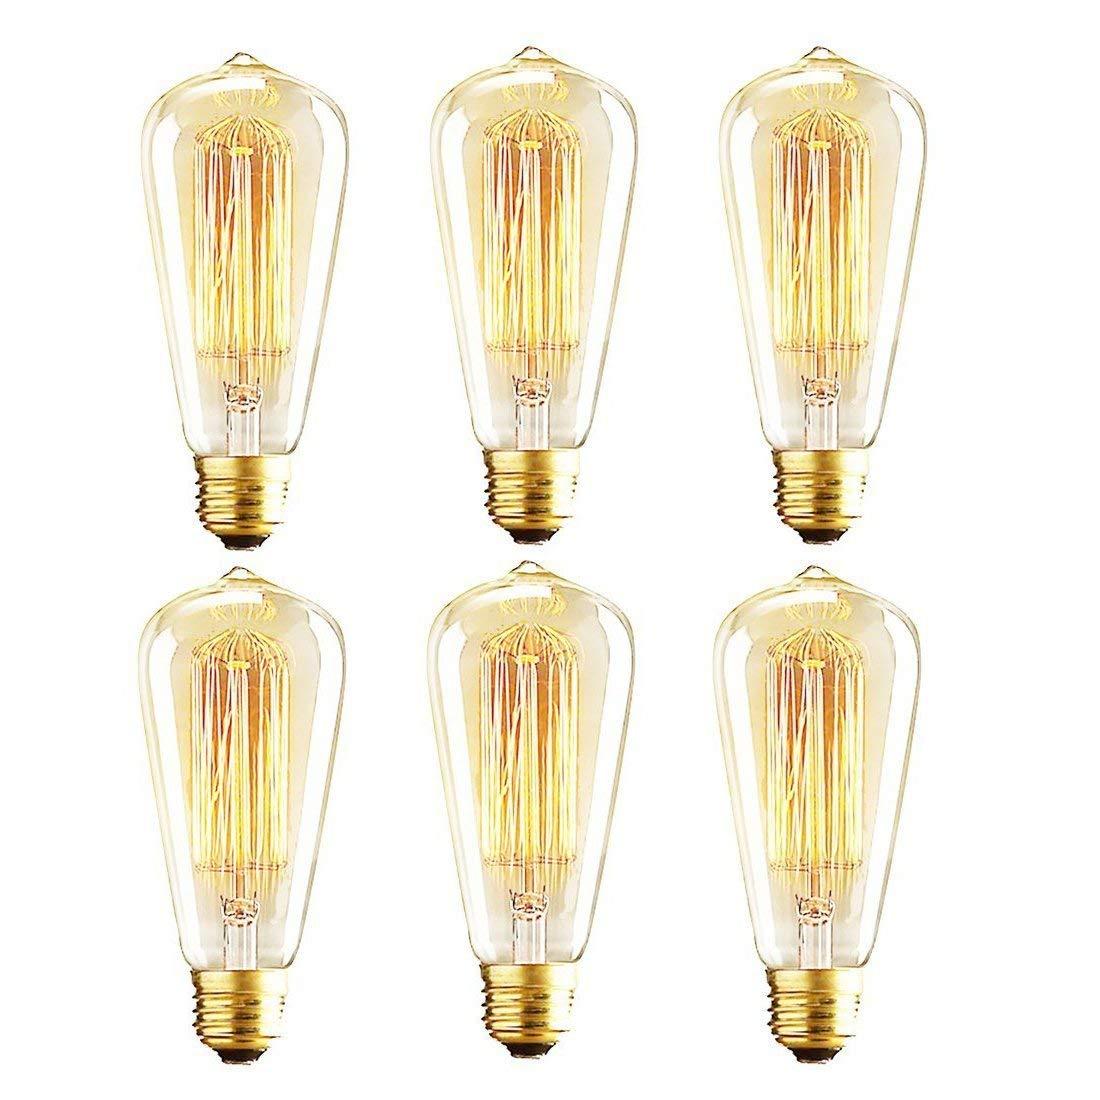 Vintage Edison Bulbs, 60W ST64 Dimmable Incandescent Light Bulbs, Squirrel Cage Filament Bulbs, 2700K Soft Warm White Light Bulb, 370 Lumens, Retro Light Bulbs, Amber Glass,E26 Medium Base, Pack of 6